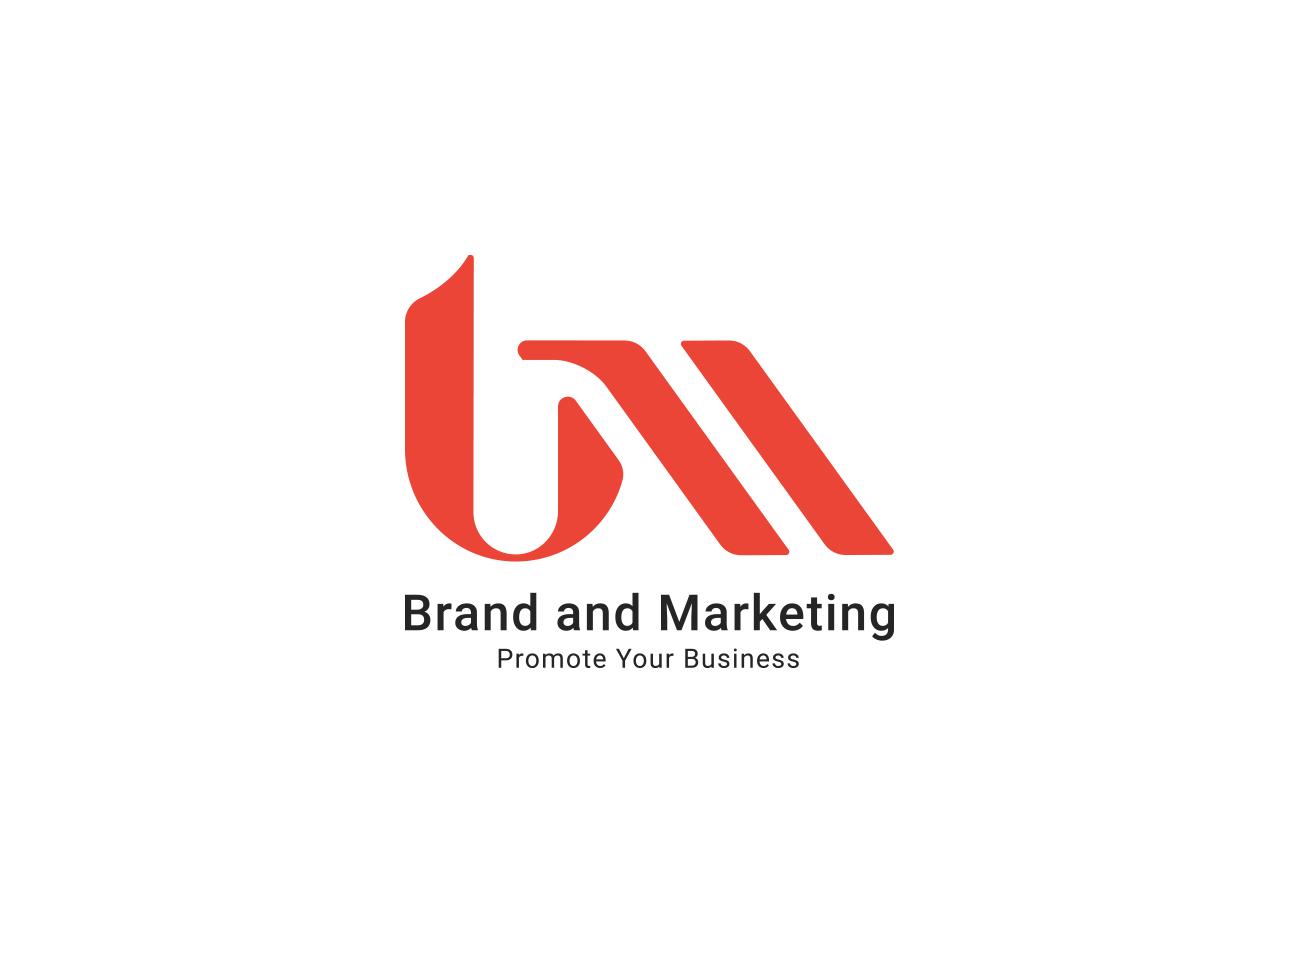 BNM Brand & Marketing graphic identity  mark  symbol identity type design vector illustration businesslogo brand mark branding typography logo